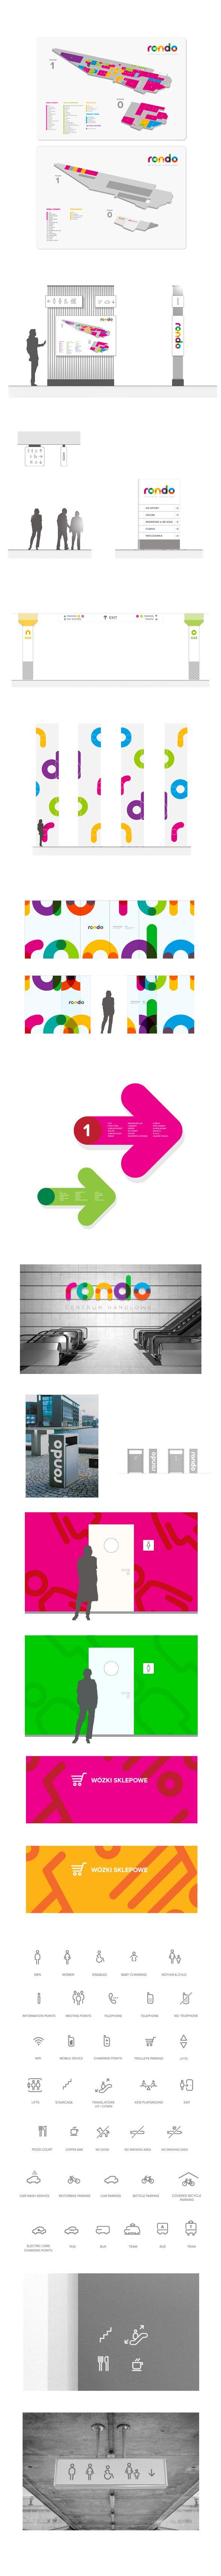 shopping mall RONDO re-branding by piotrek bdsn okrasa, via Behance